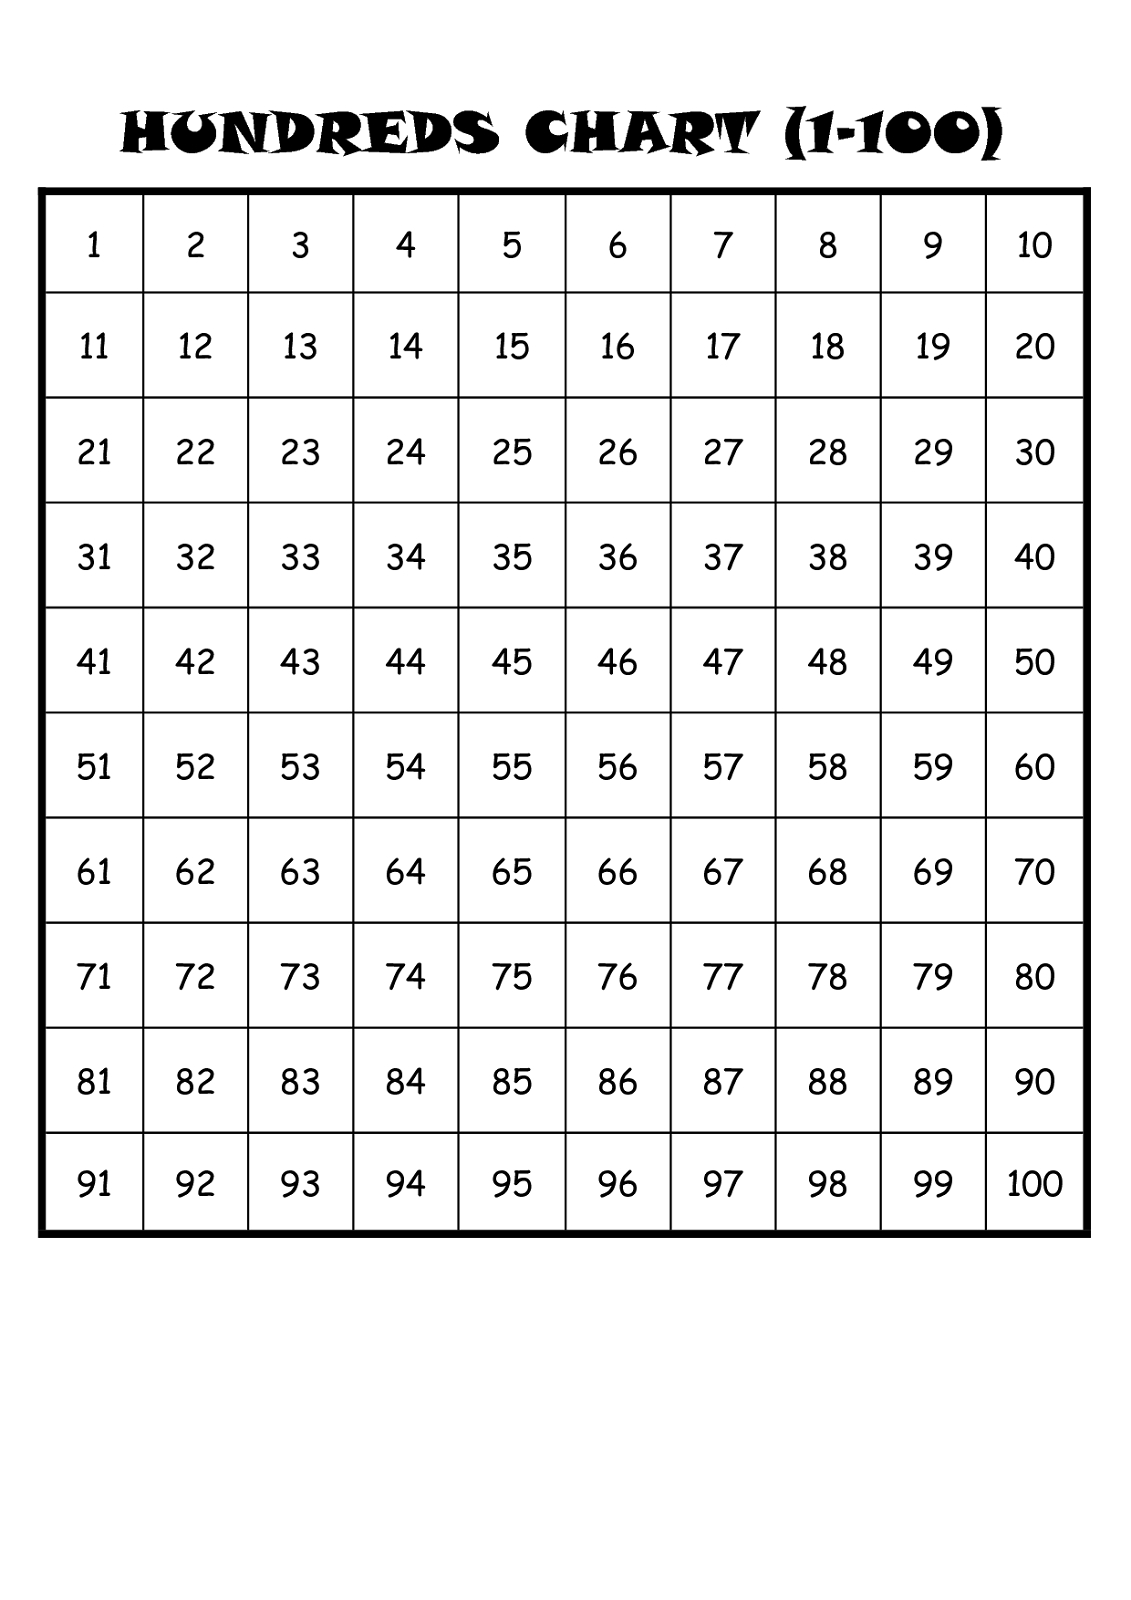 Number Sheet 1-100 To Print | Math Worksheets For Kids | Kids Math - Free Printable Number Worksheets 1 100